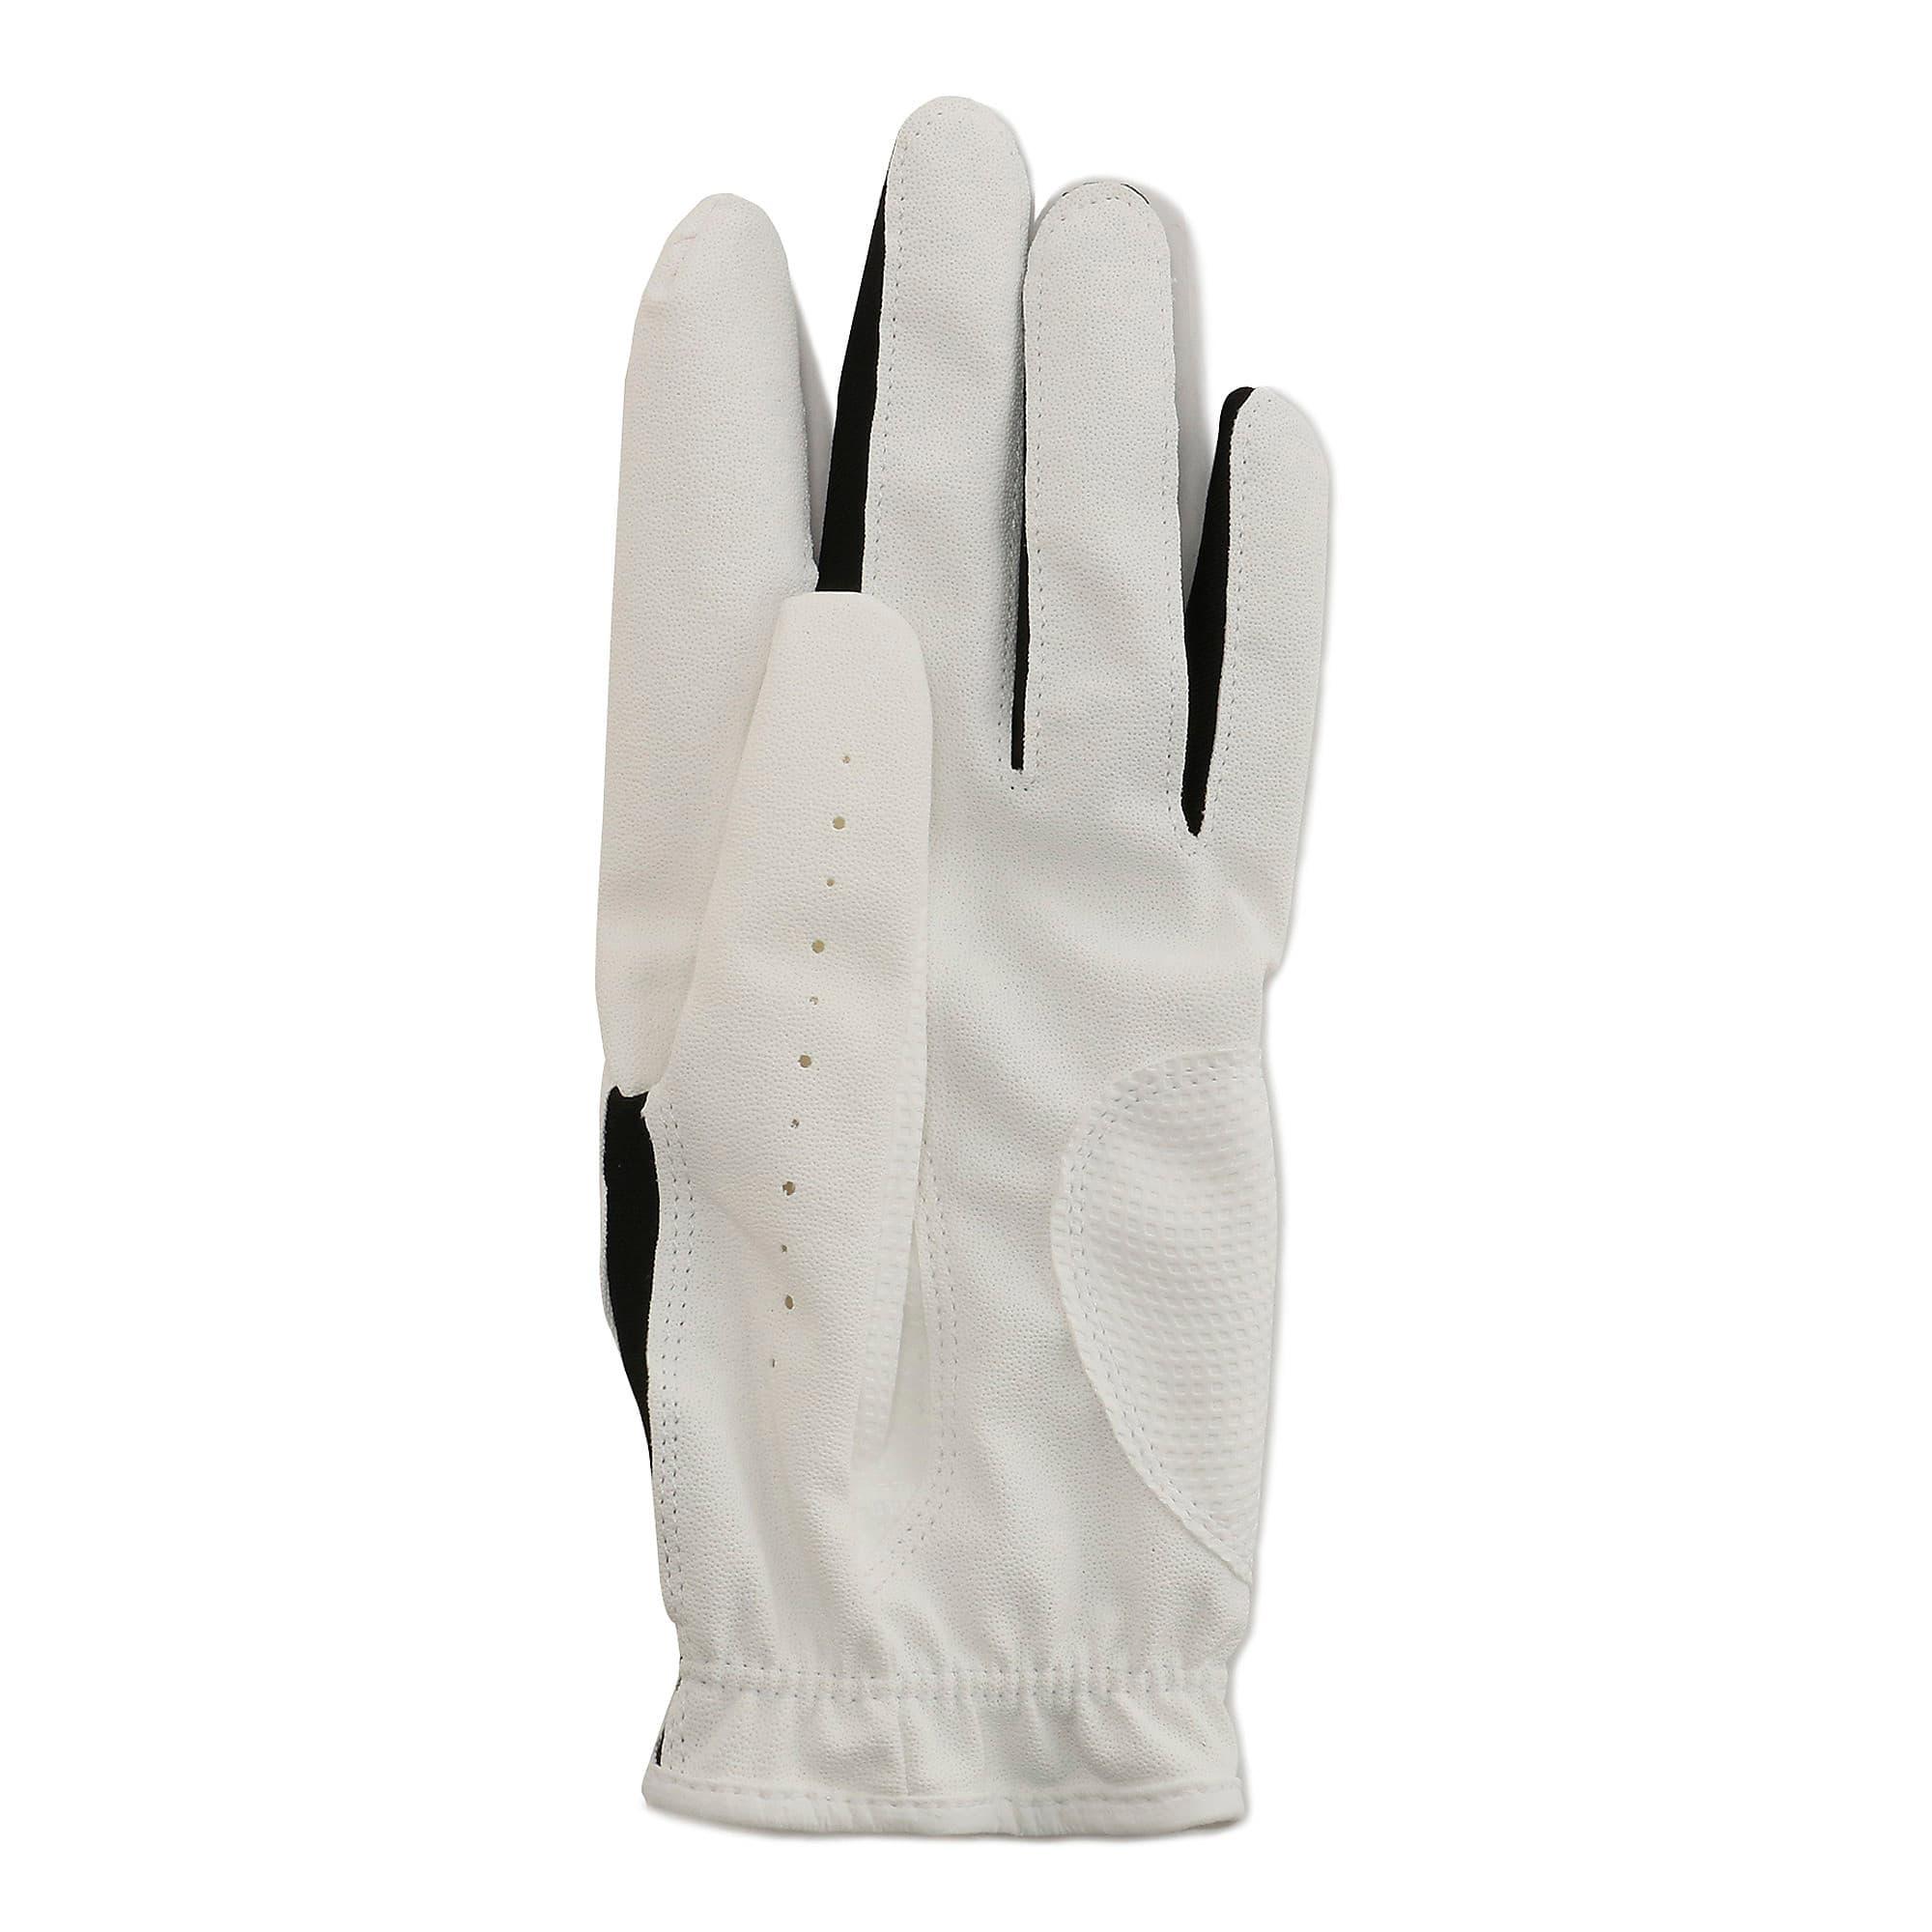 Thumbnail 2 of ゴルフ 3D ウィメンズ パフォーマンス グローブ 両手用, White / Puma Black, medium-JPN